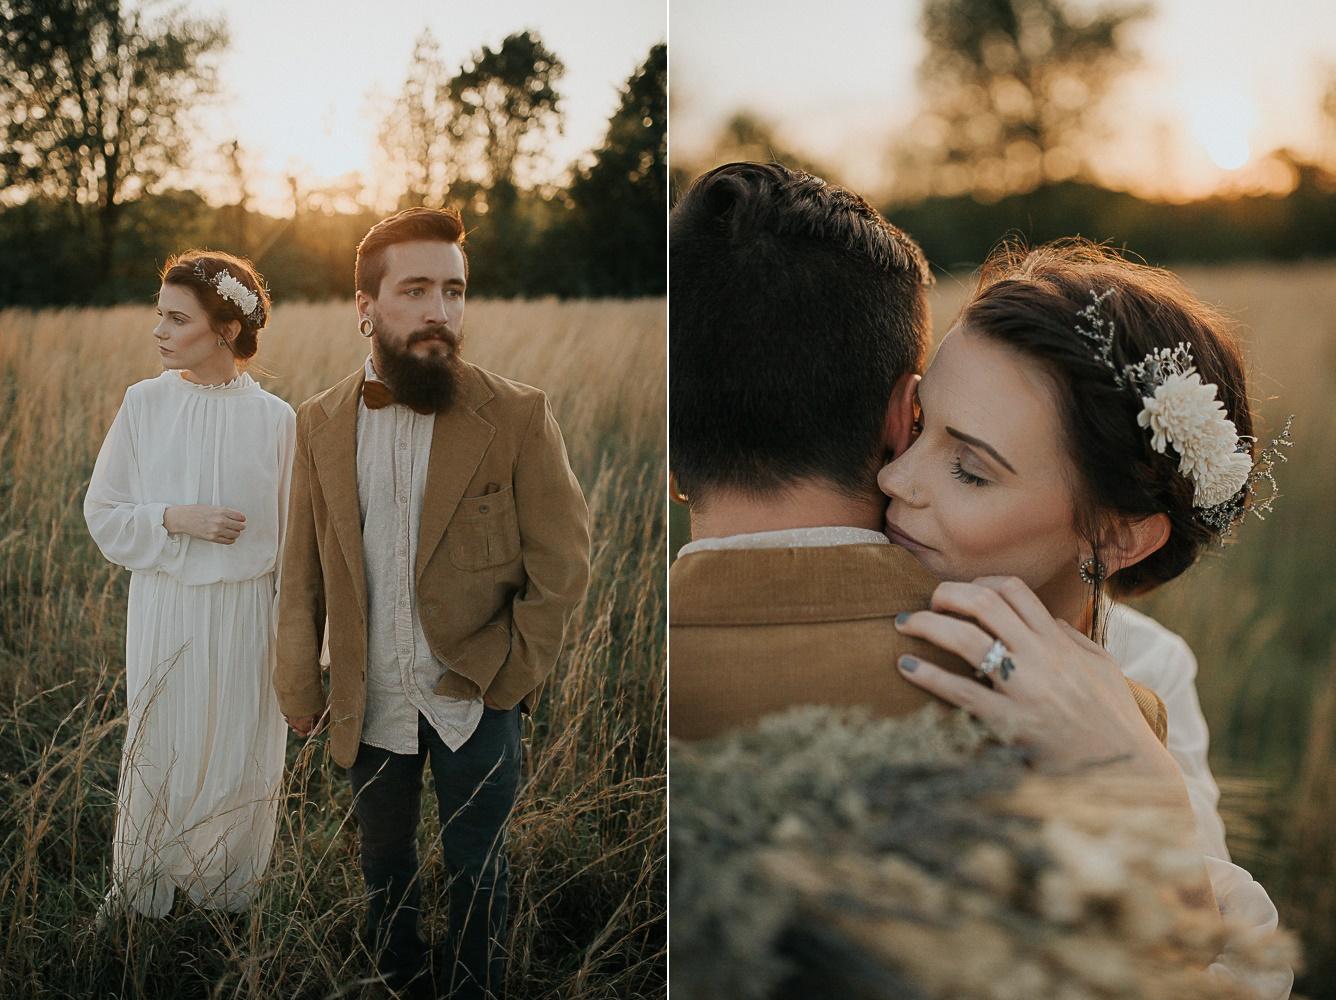 Cassie Cook Photography-Memphis TN-portrait and wedding photographer -7336-horz.jpg